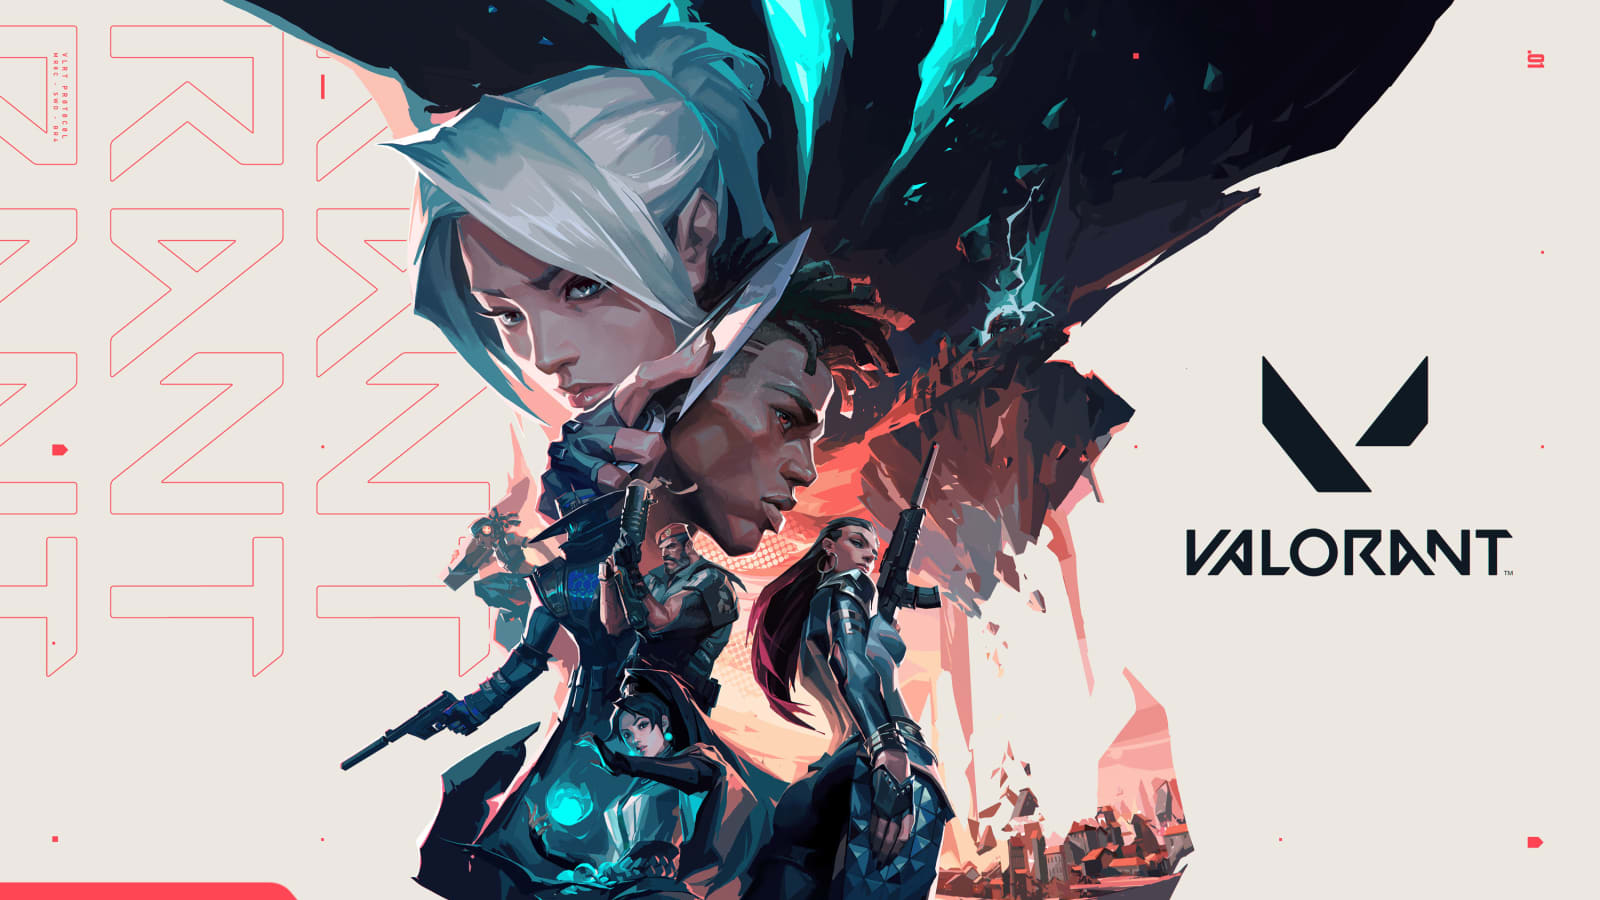 VALORANT launch: poised to be next billion-dollar gaming franchise